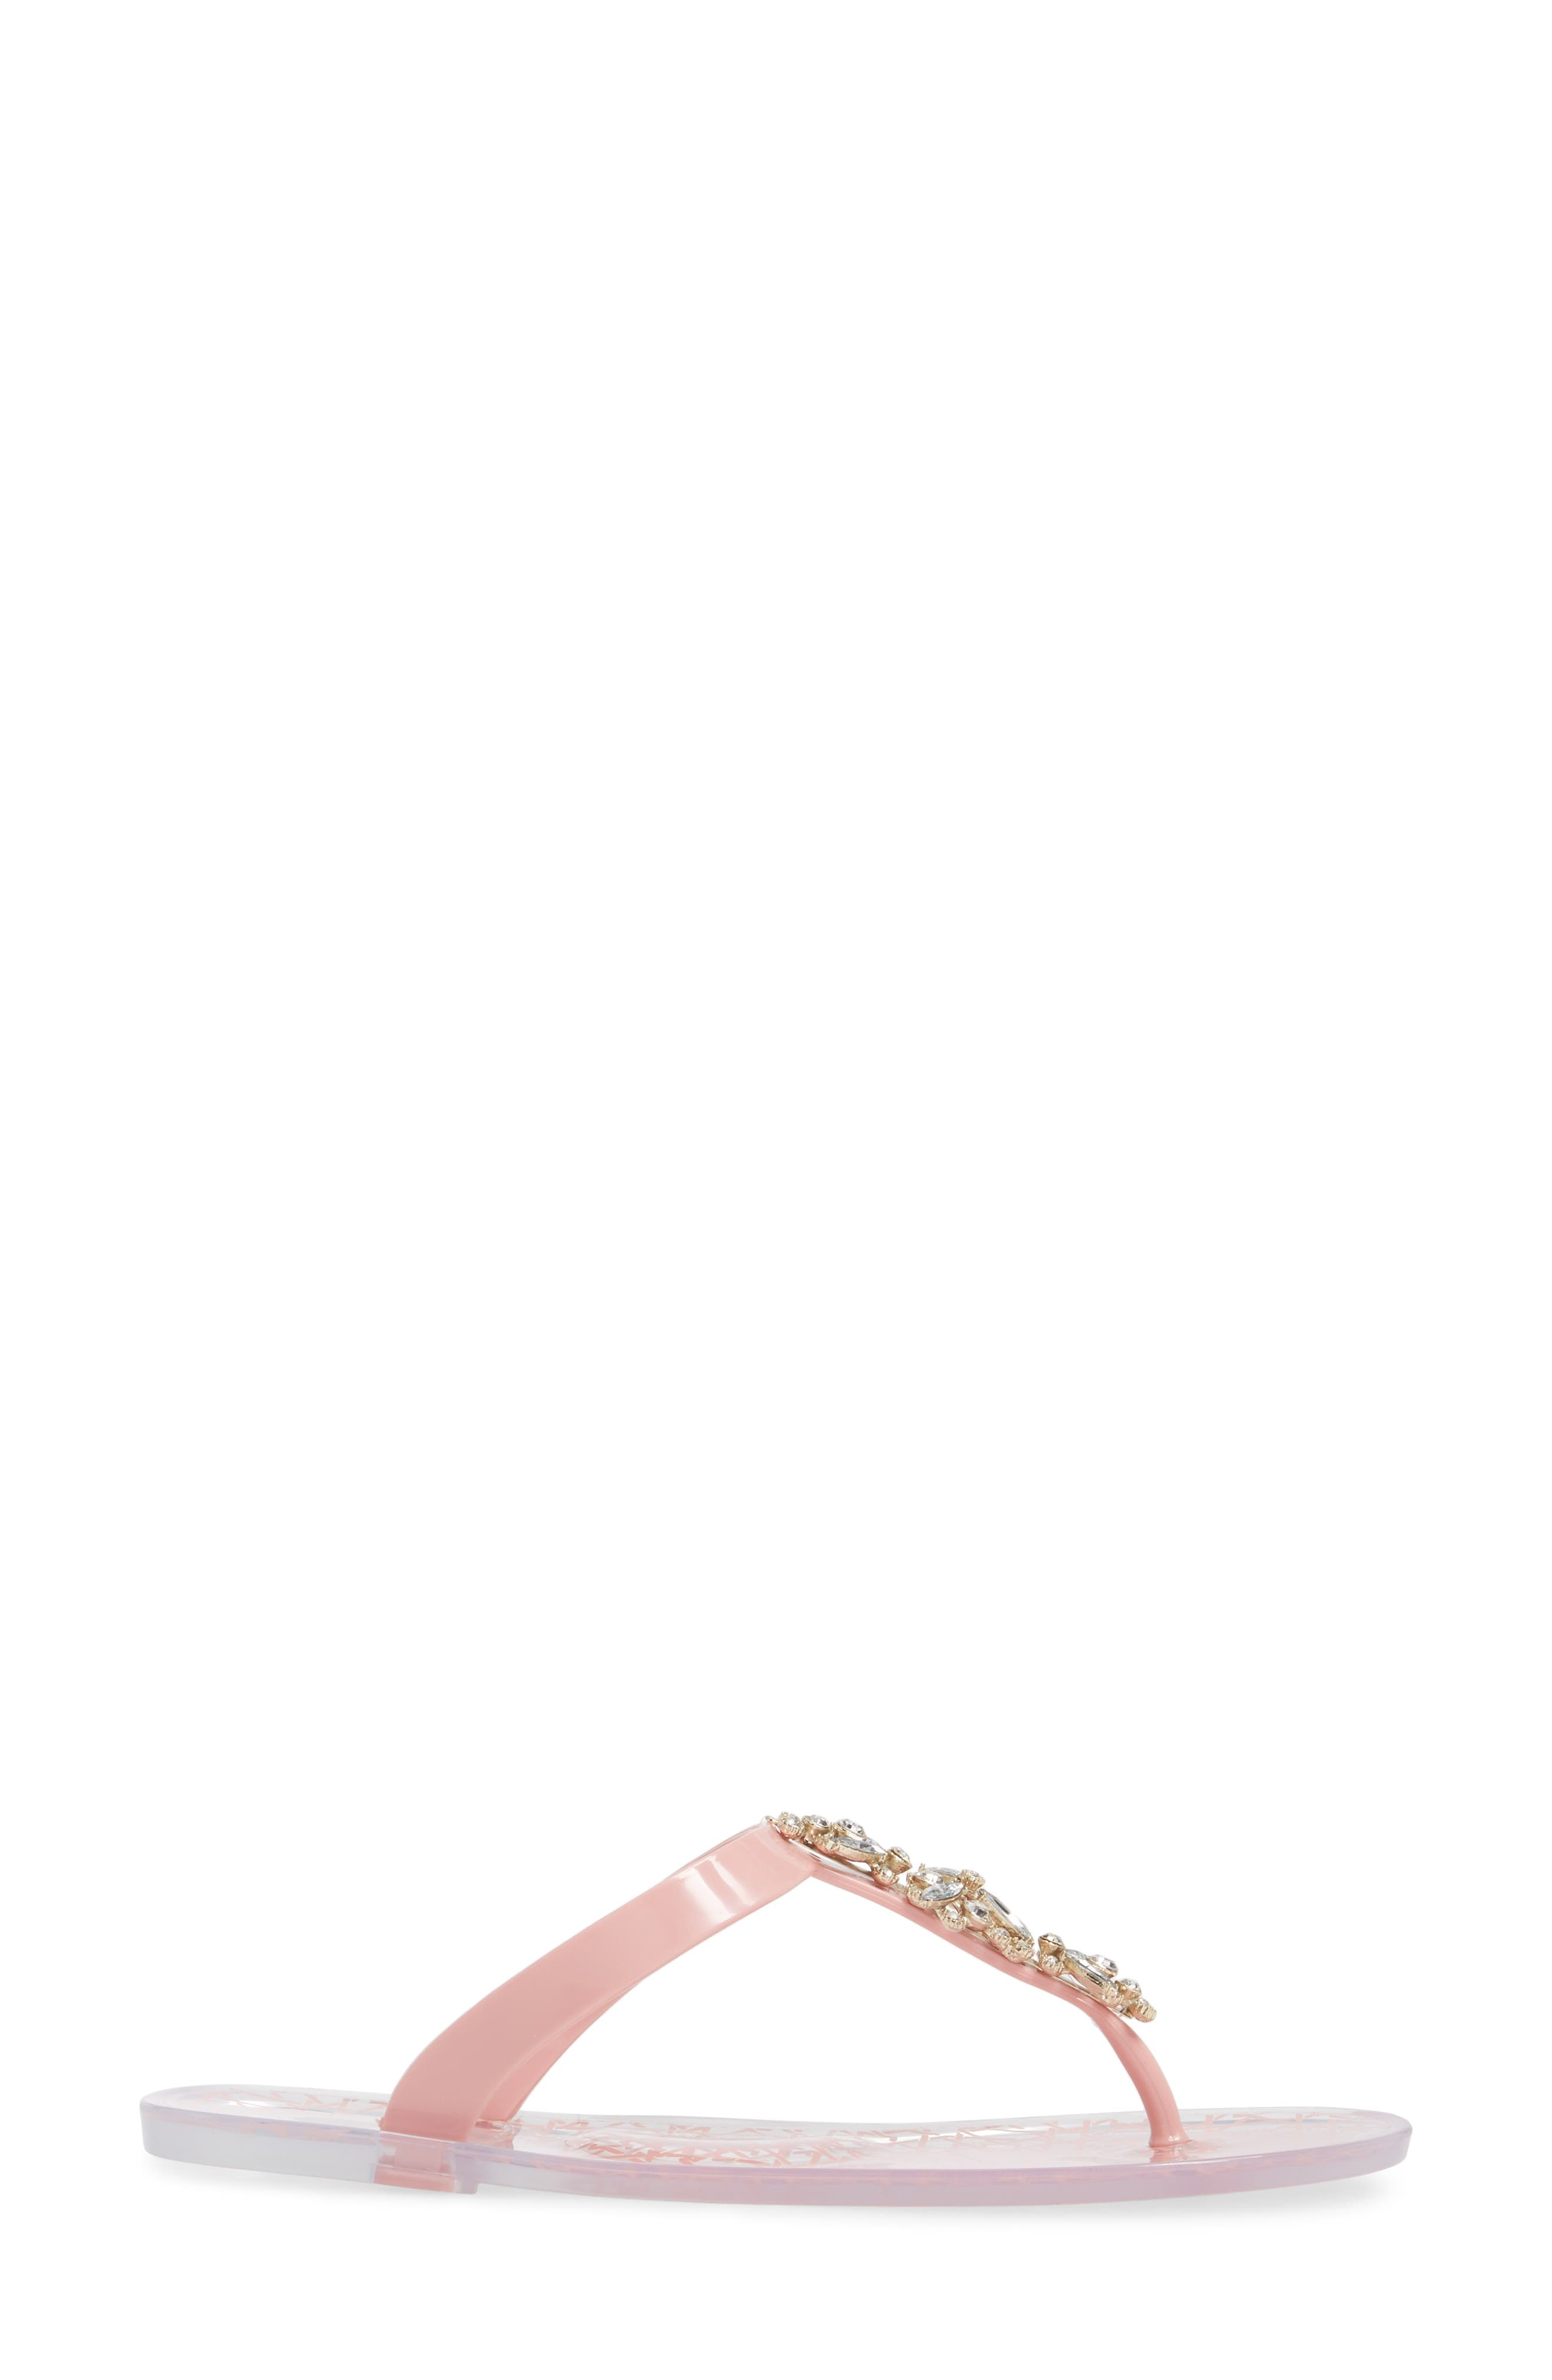 Gracia Embellished Sandal,                             Alternate thumbnail 11, color,